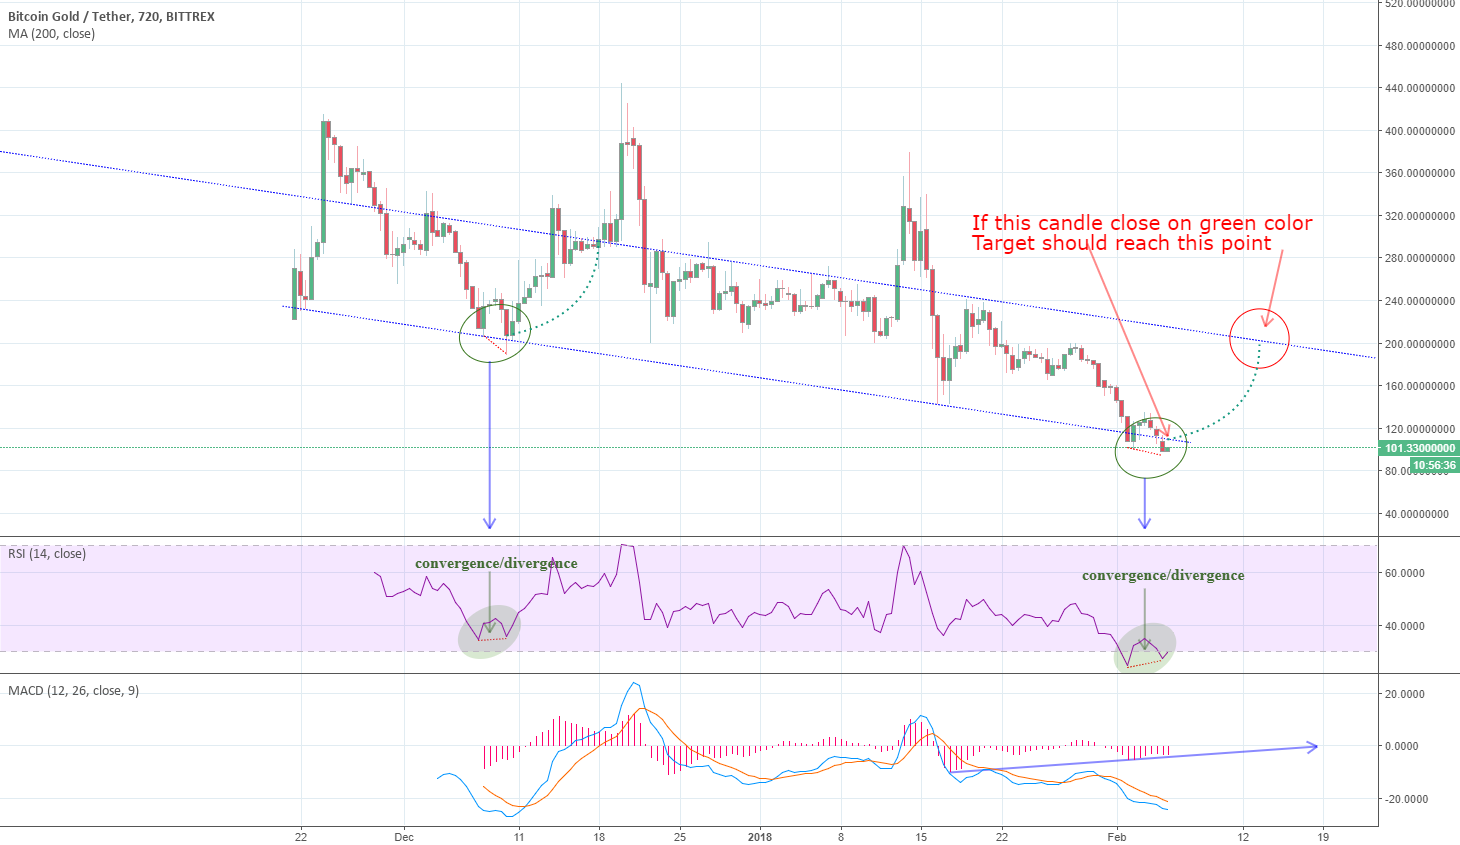 BTG bitcoin gold convergence/divergence